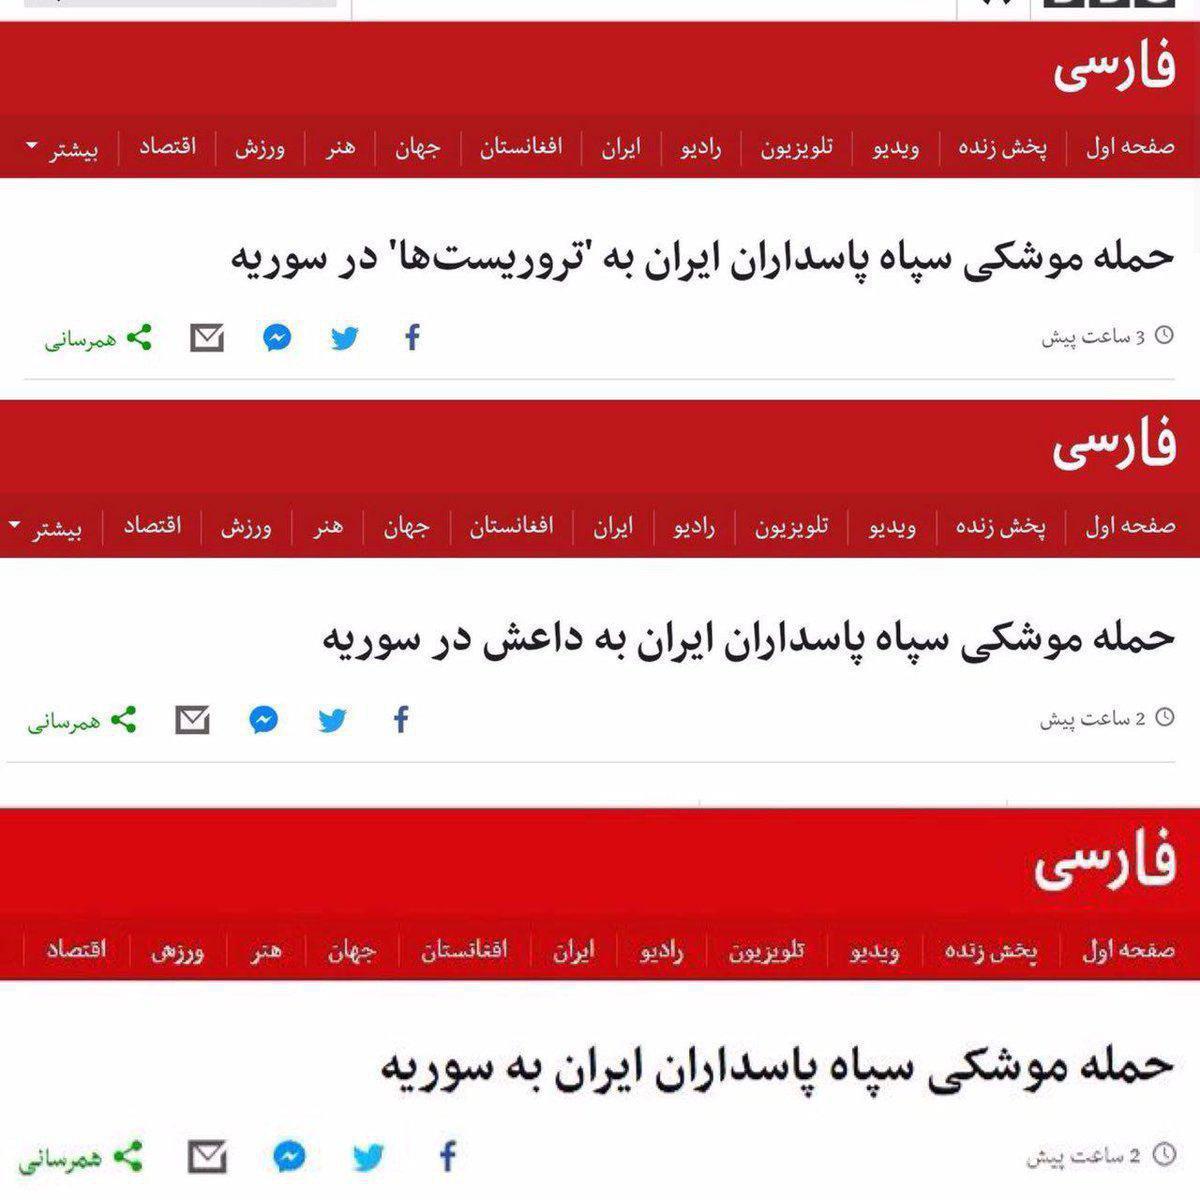 www.dustaan.com سه بار تغییر در تیتر BBC پس از انتقام موشکی سپاه +عکس